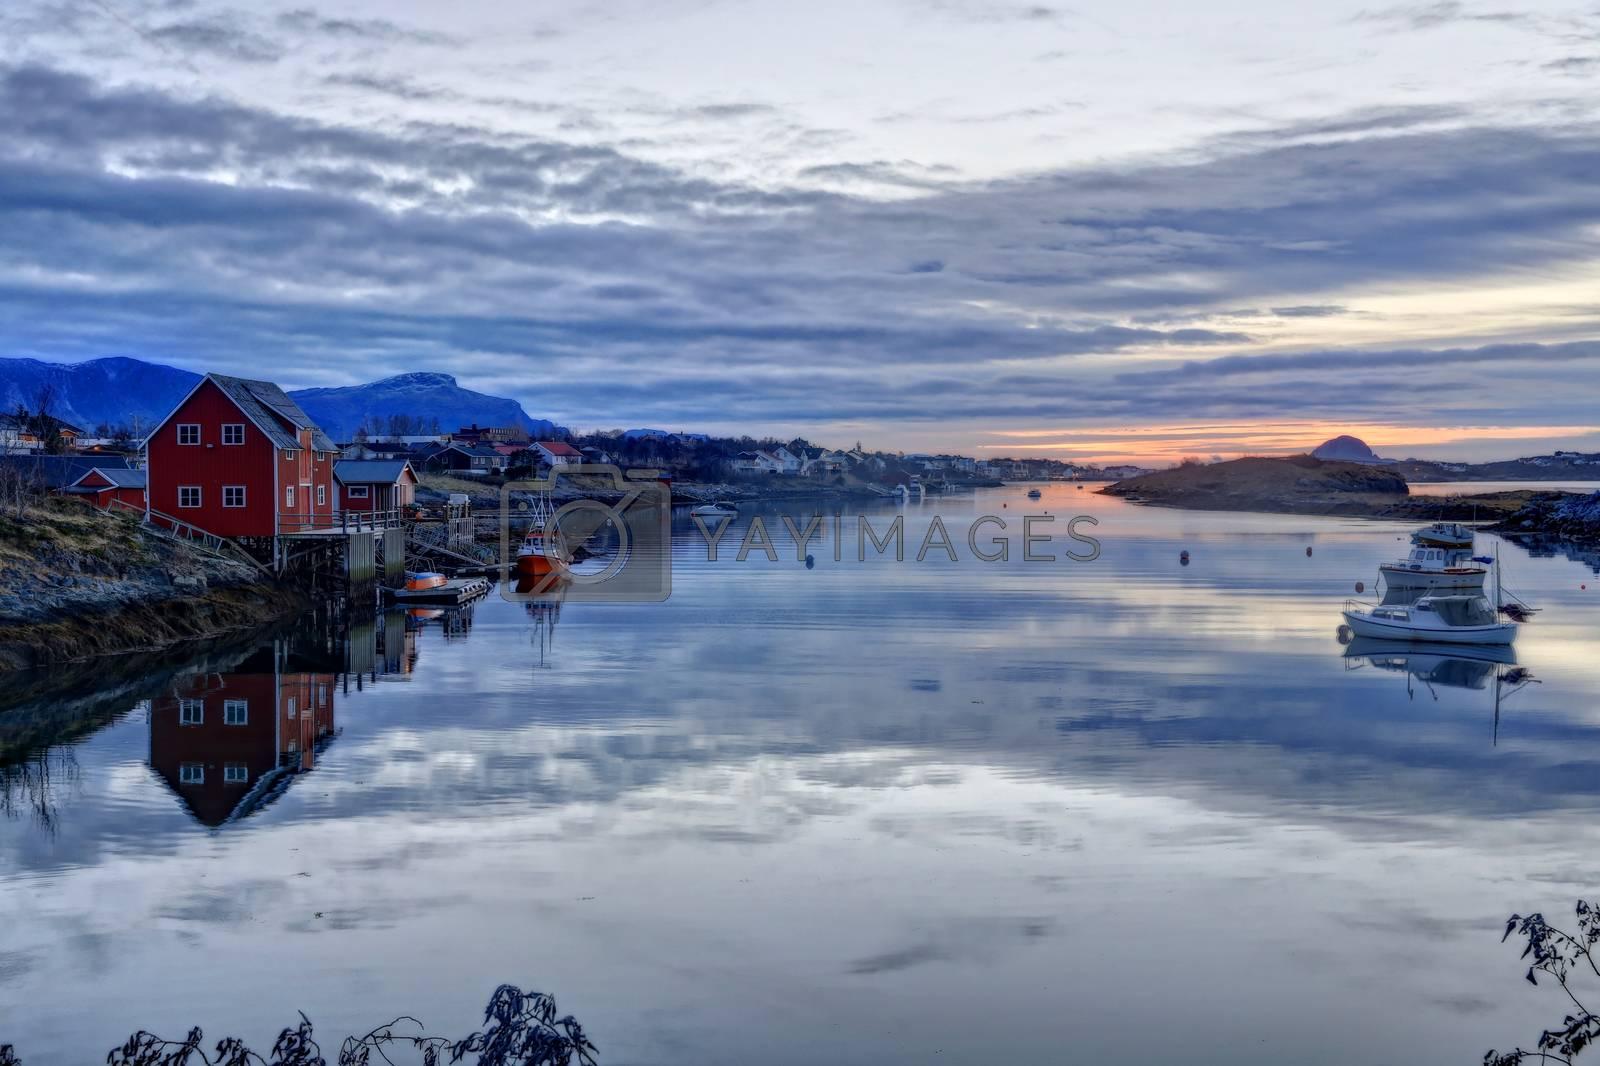 Solnedgang i Salhussundet i Brønnøysund